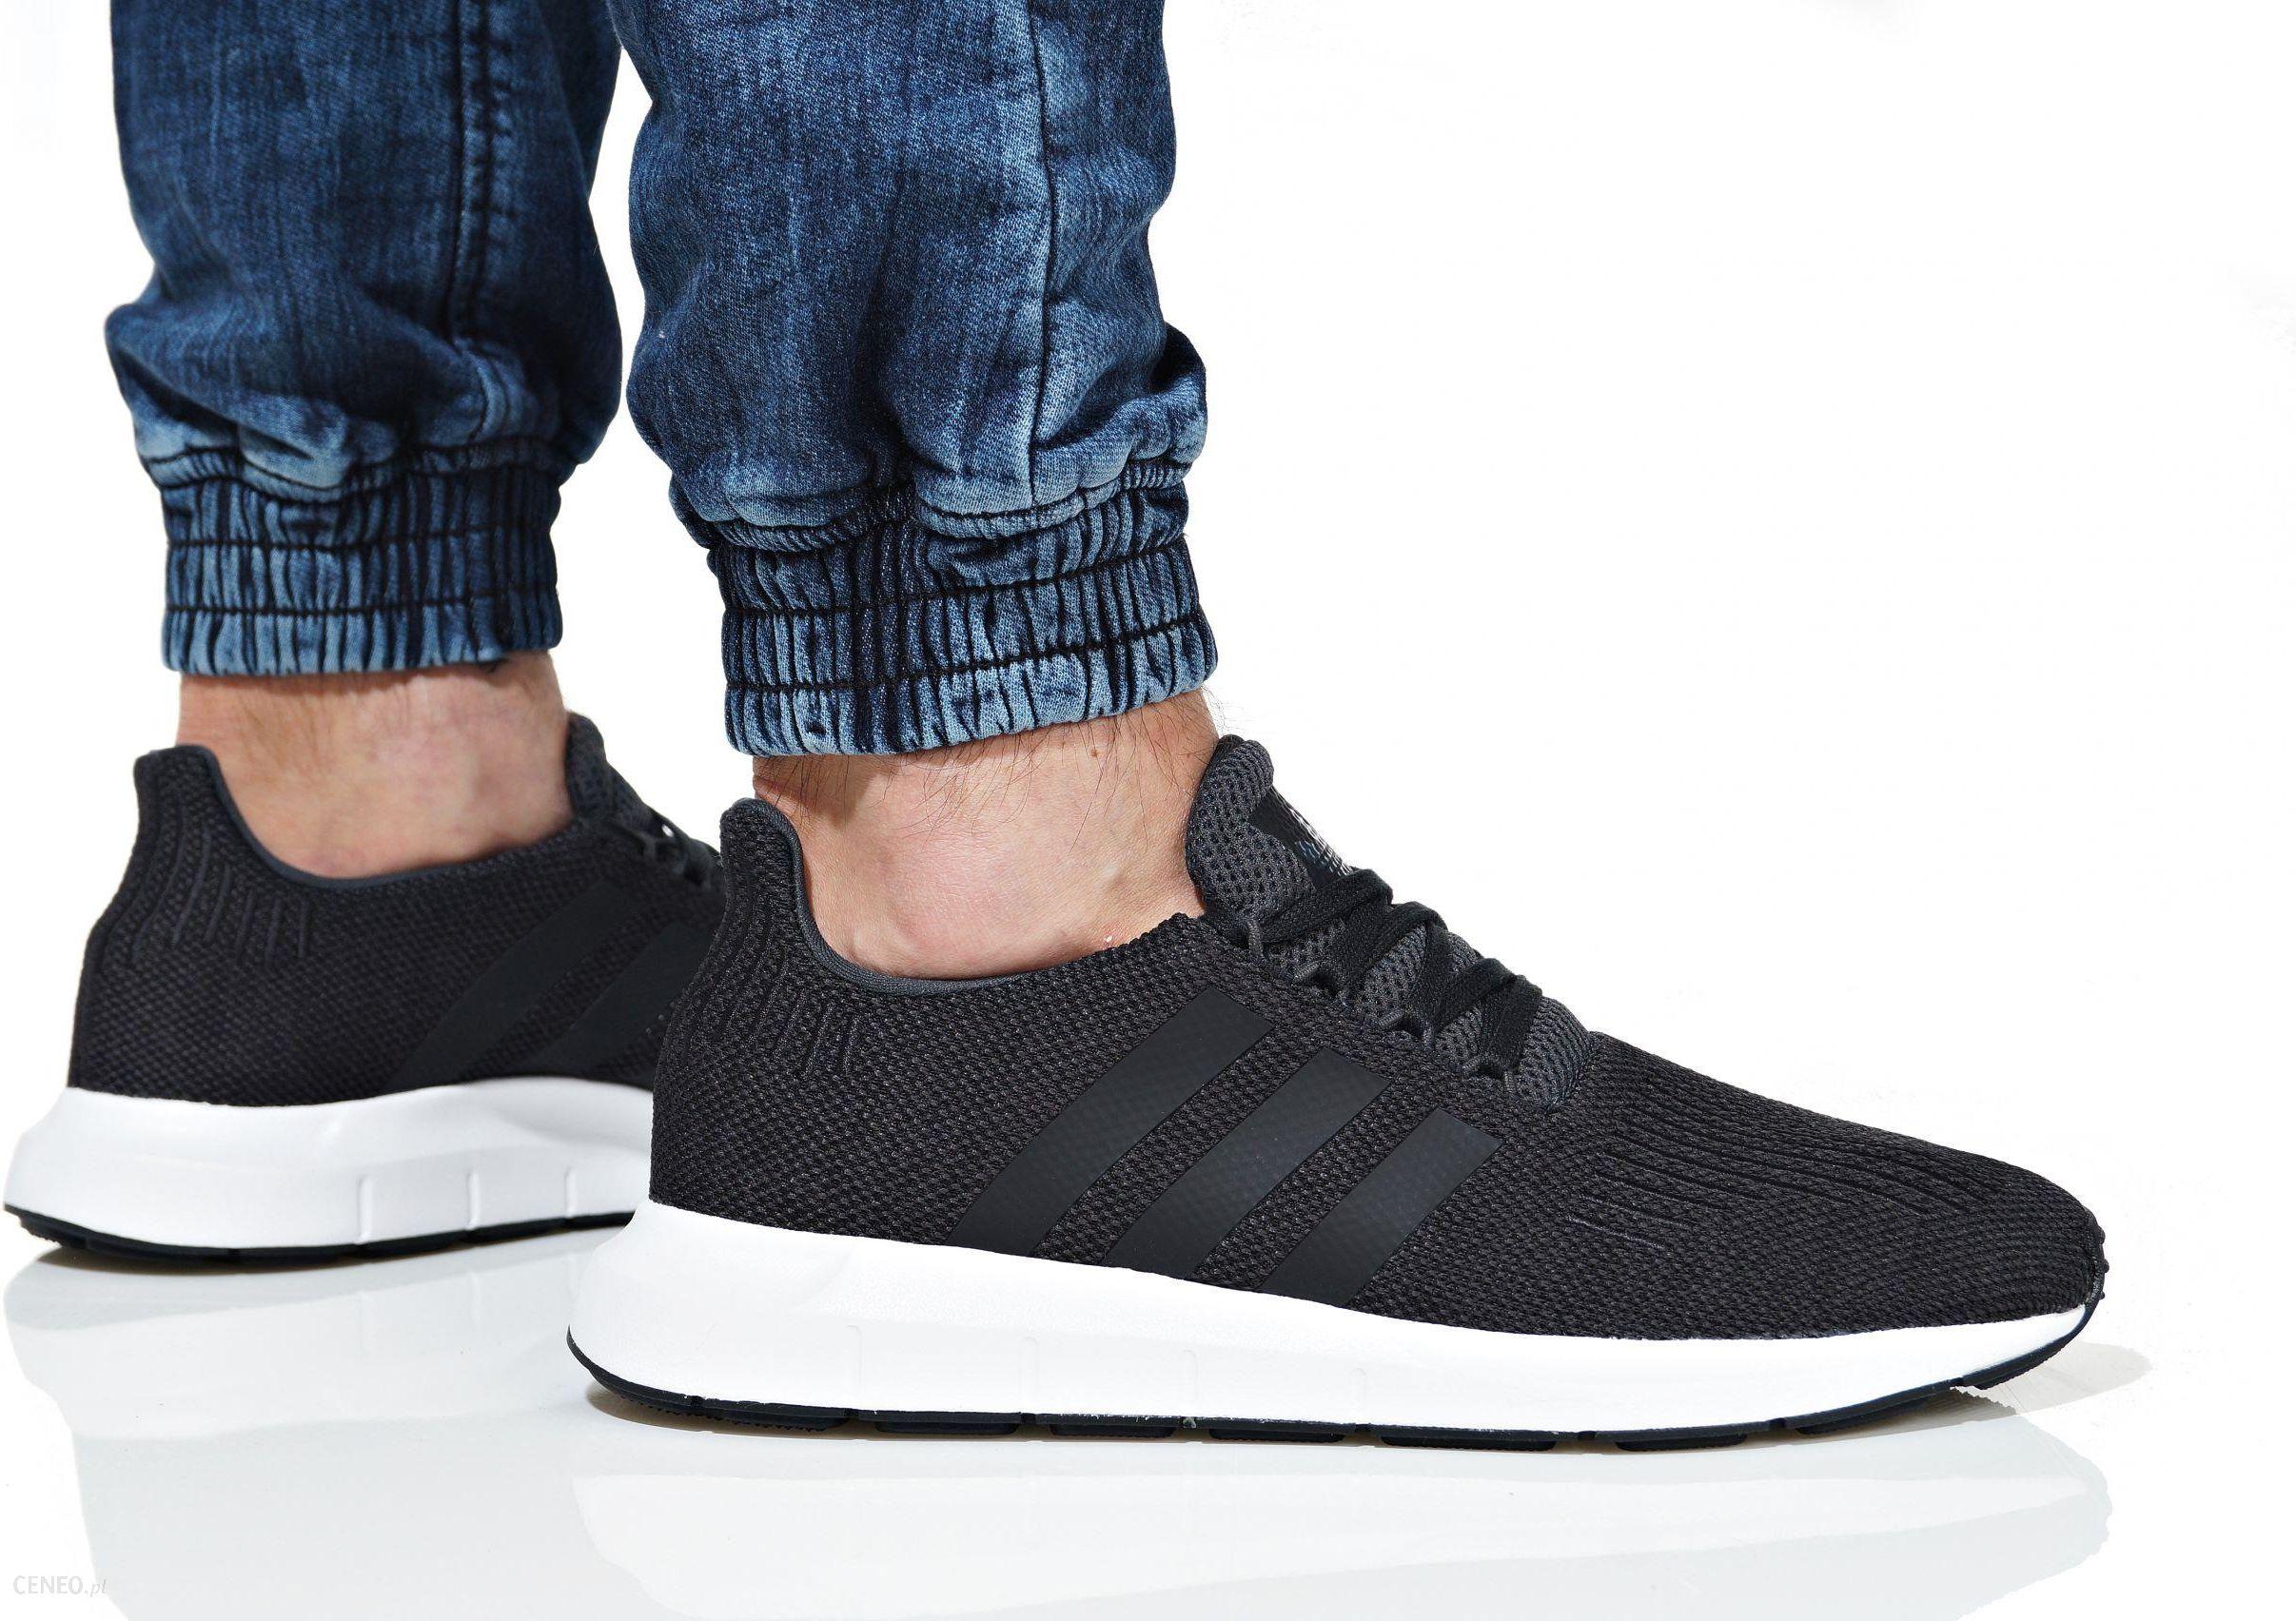 Buty męskie sneakersy adidas Originals Swift Run CQ2114